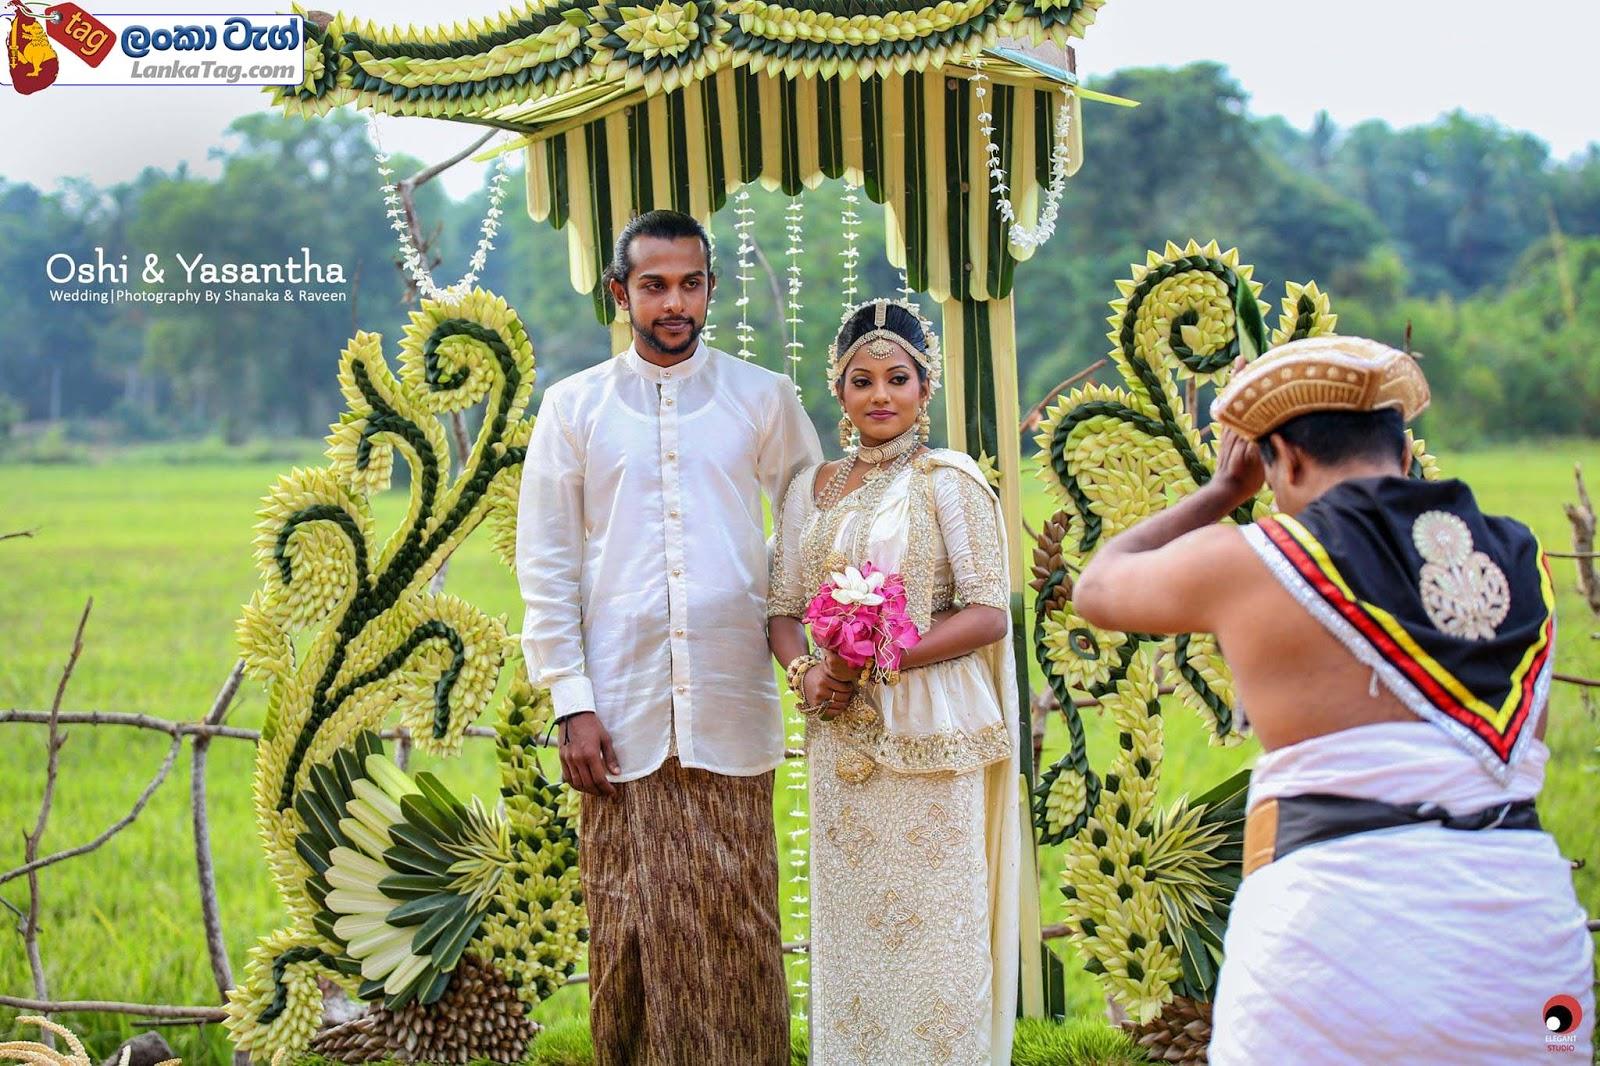 sri lankan wedding dress  2